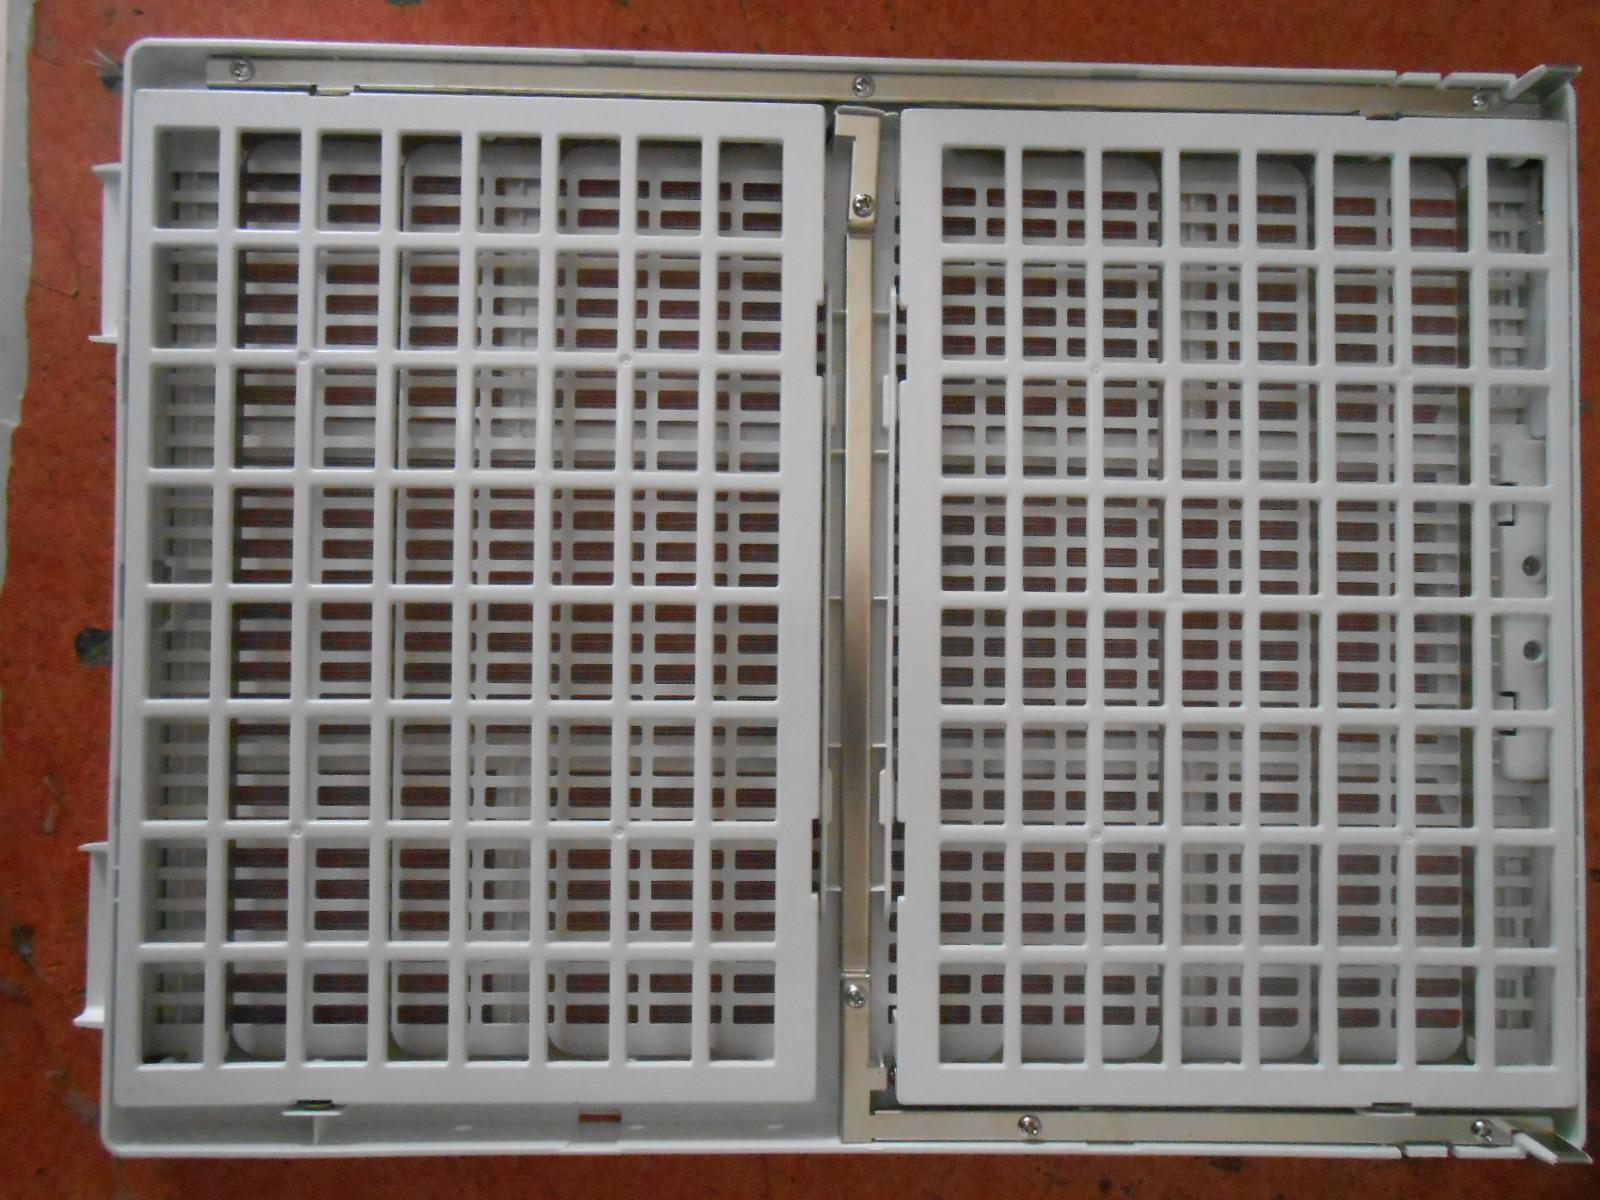 [9m8杂货铺净化,加湿抽湿机配件]莱克空气净化器KJ701-3配件 耗月销量0件仅售250元